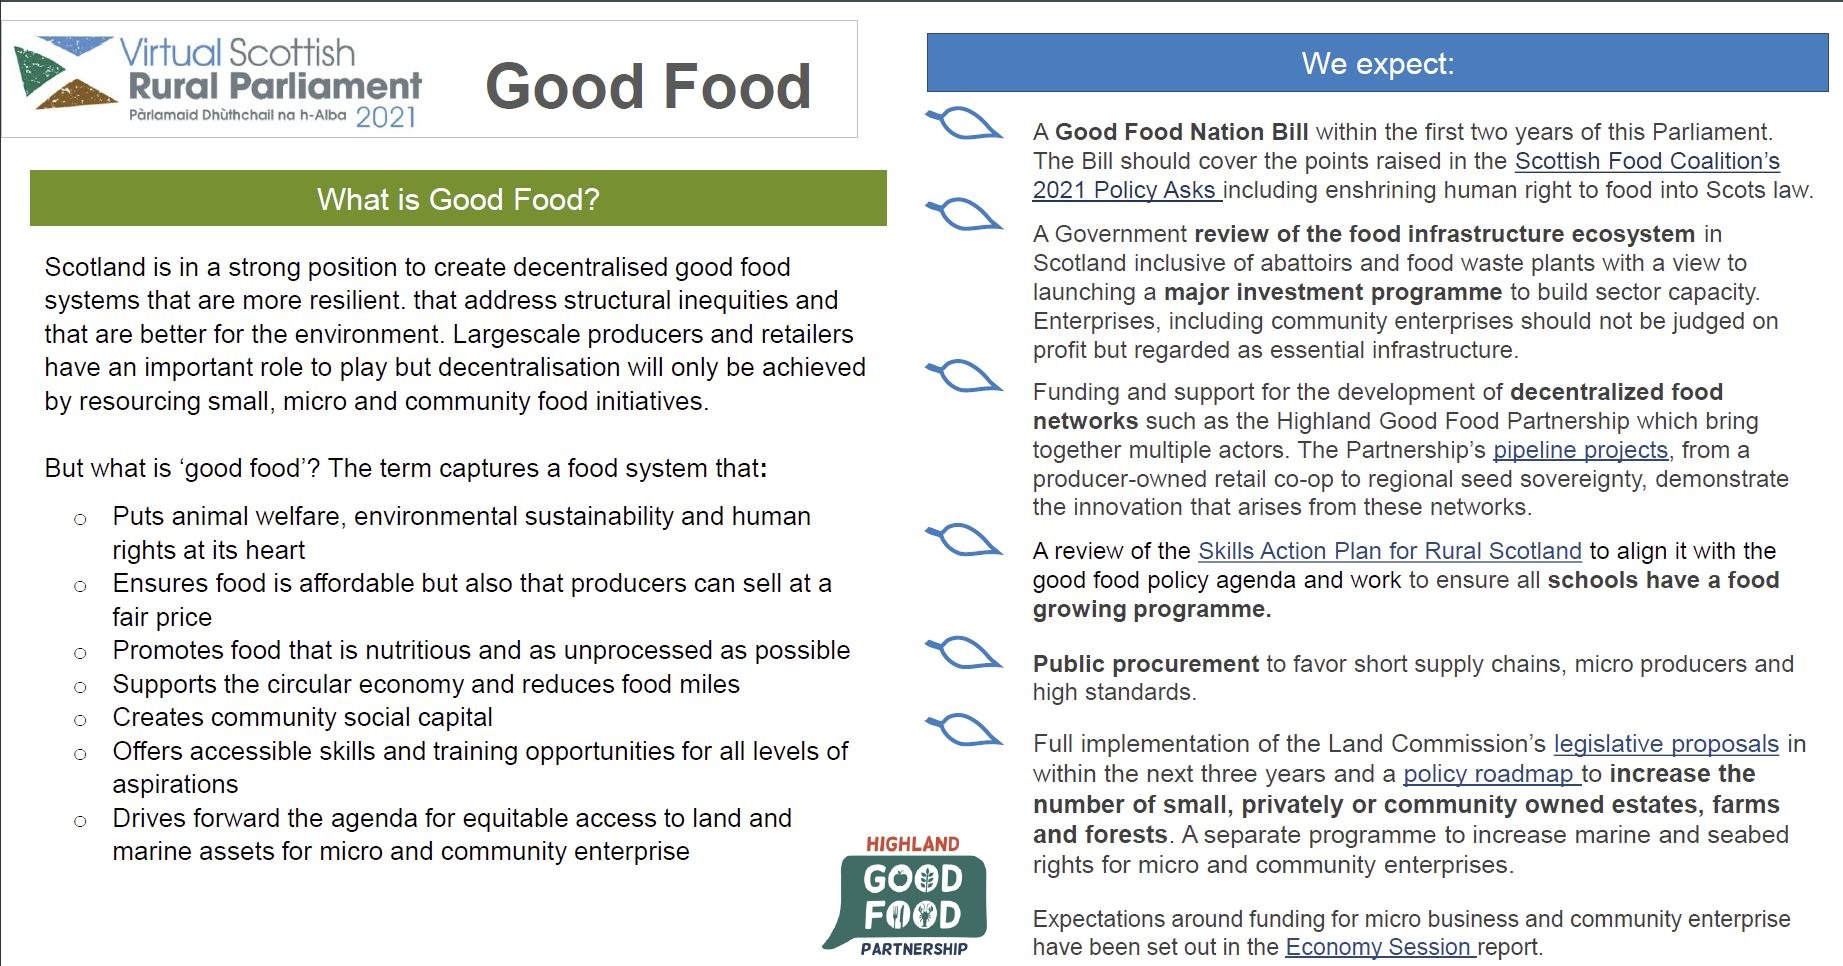 vRSP21 Session Recommendations - Good Food